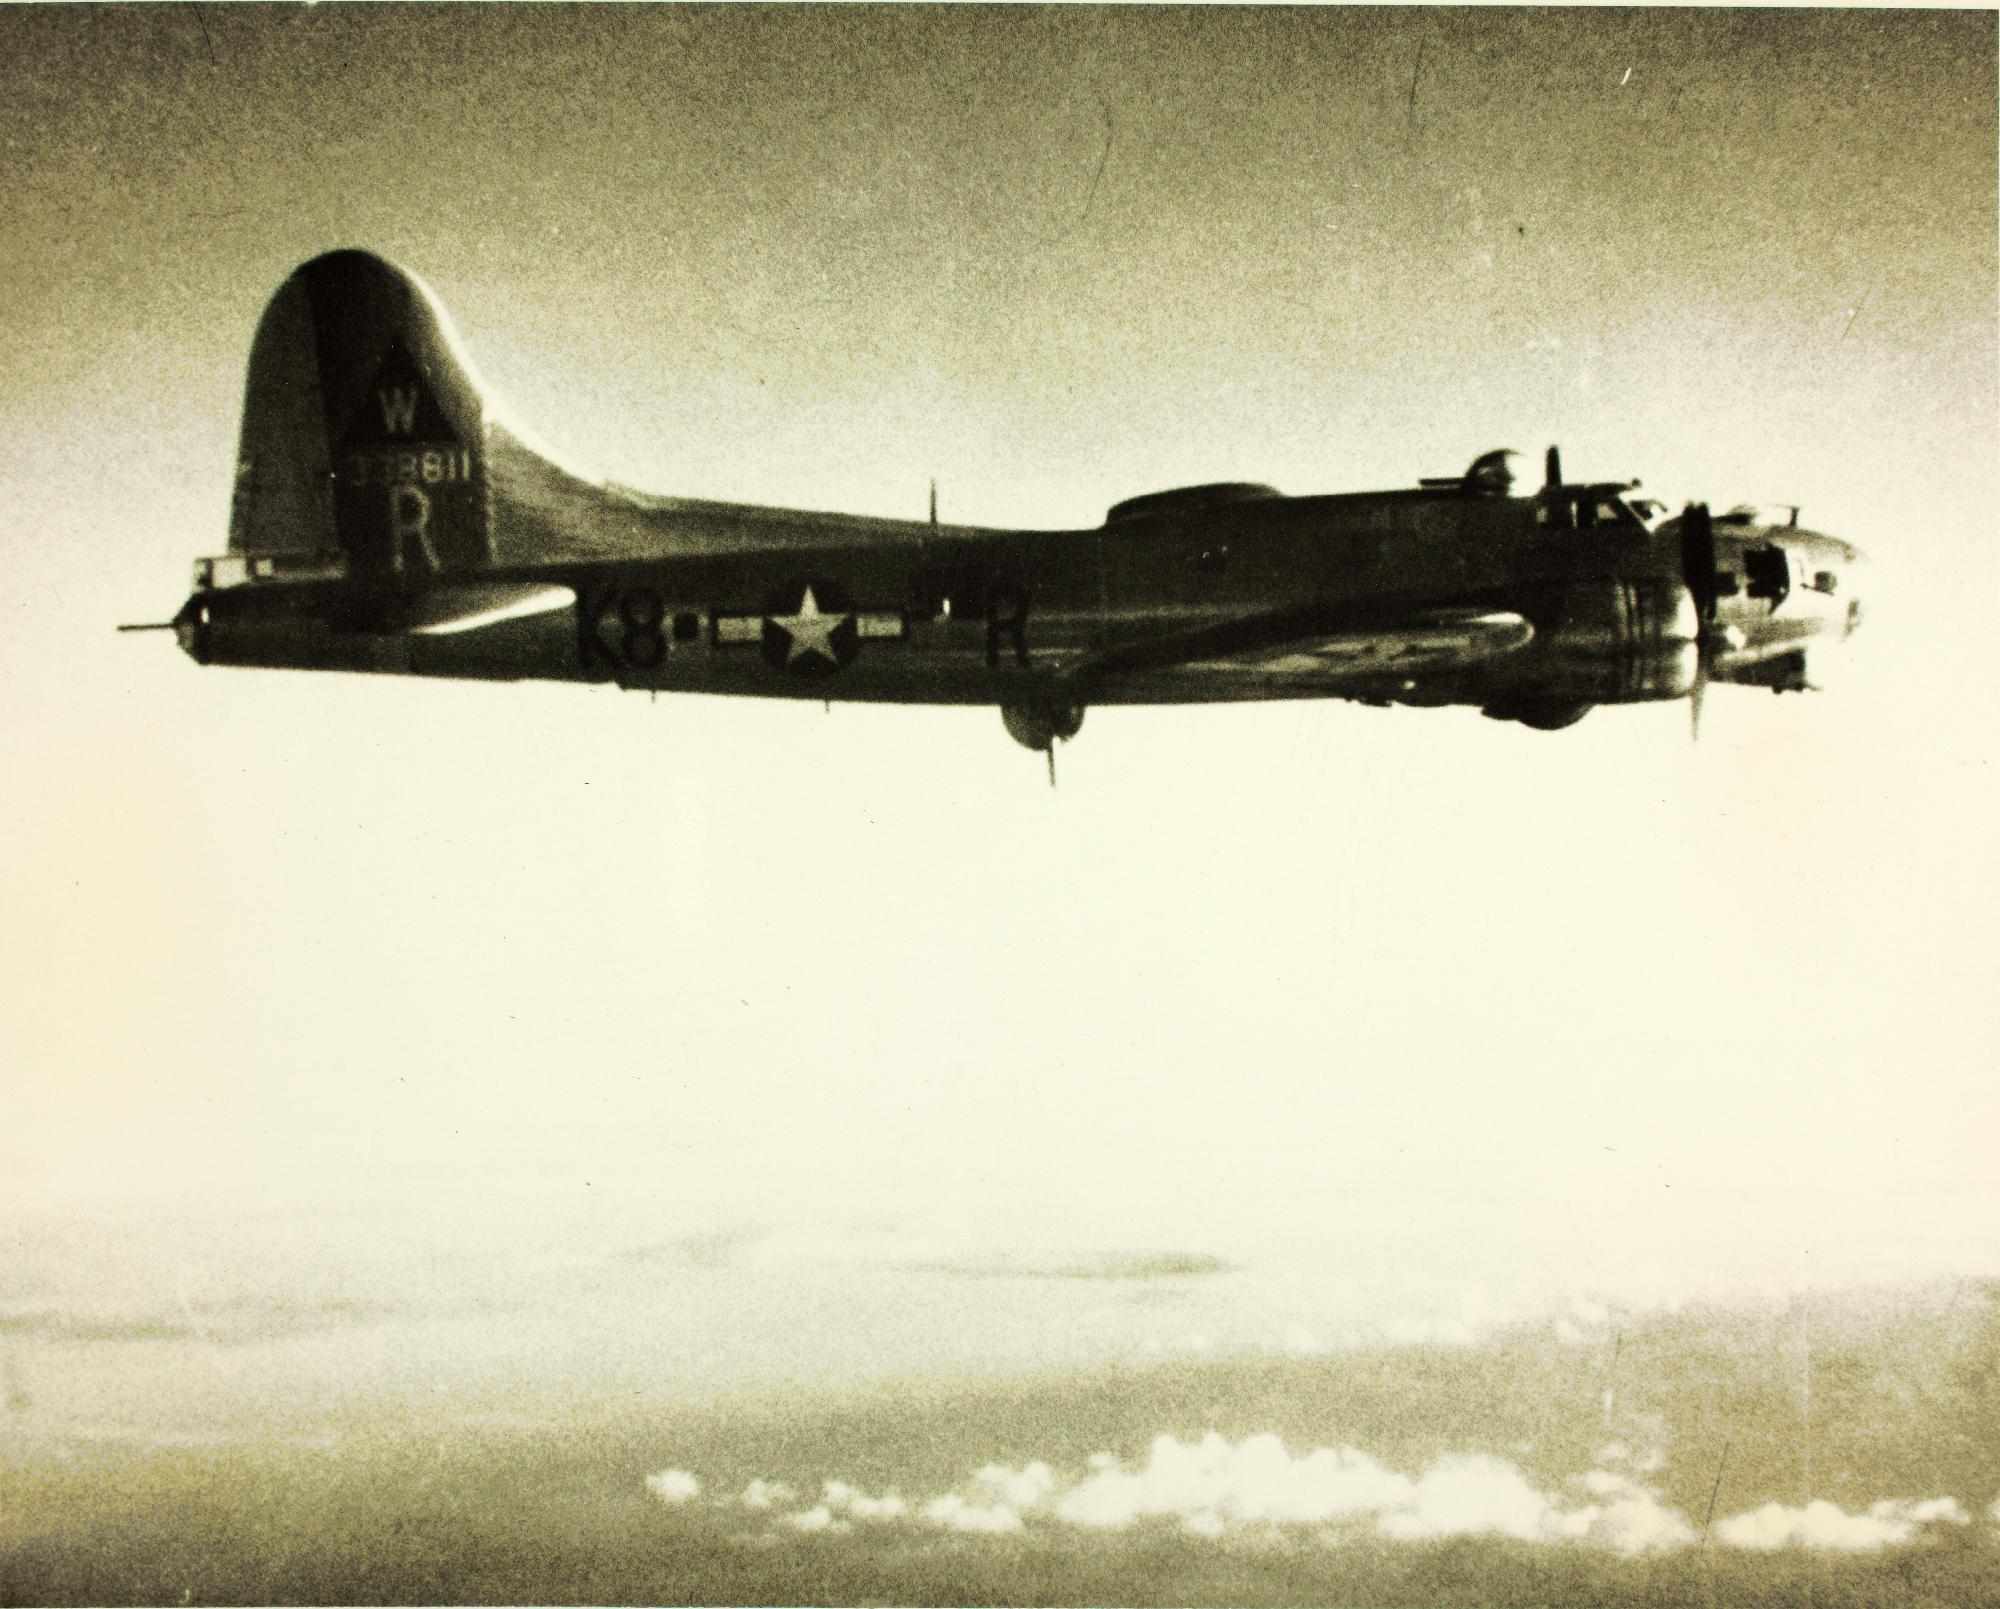 B-17 #43-38811 / Coffee's Grinder aka Little Obnoxious